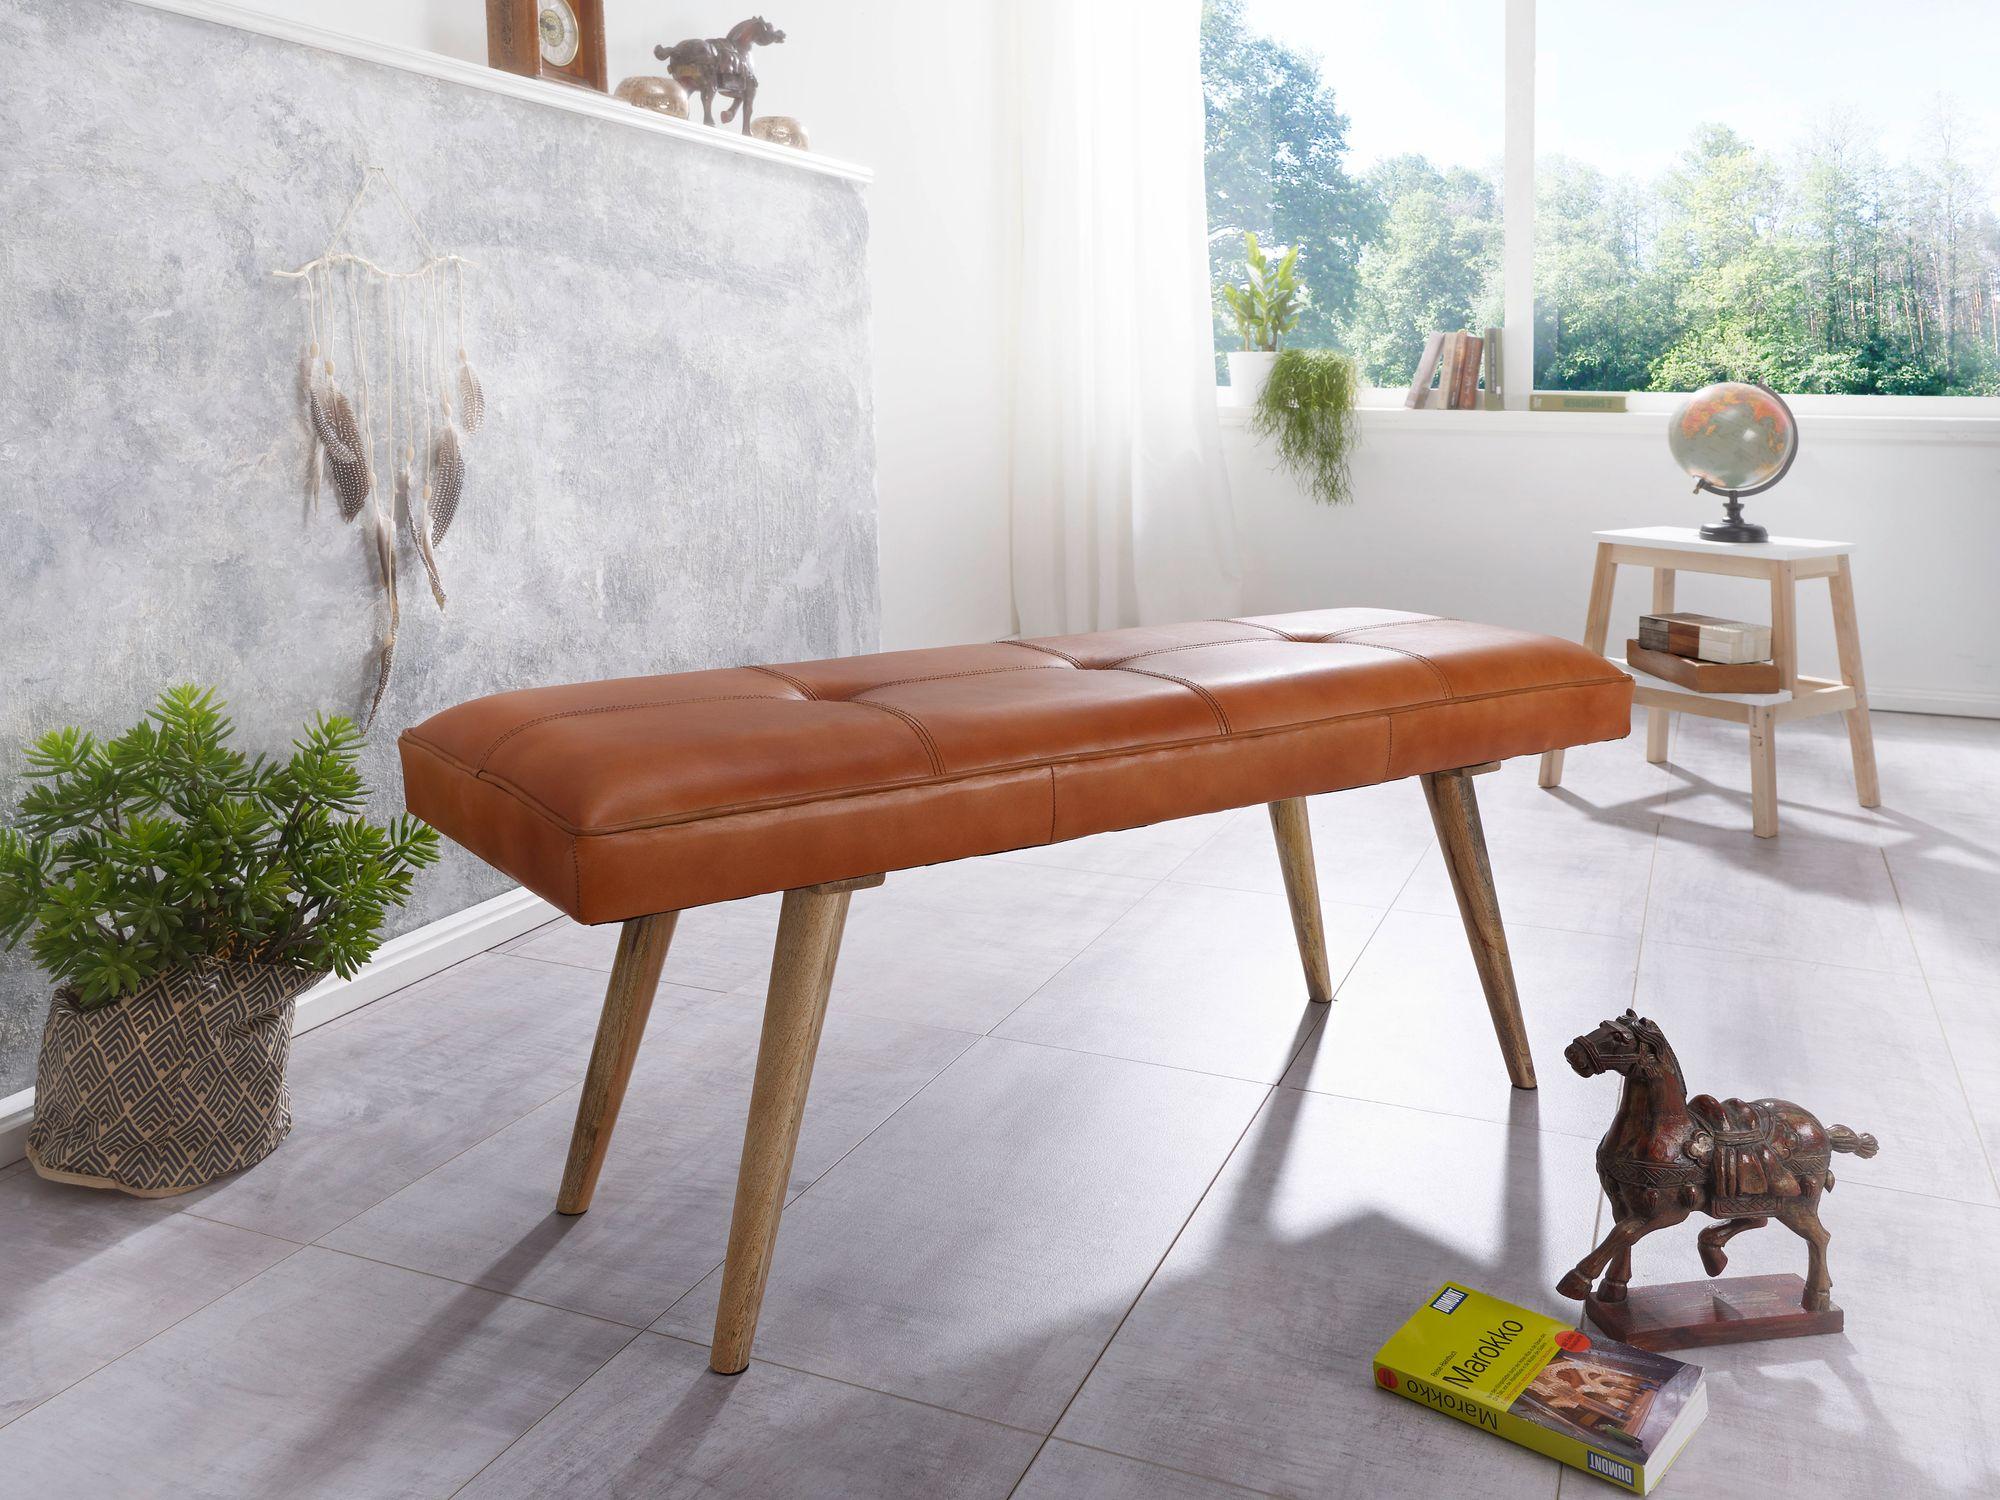 Distanza Panca Da Tavolo : Finebuy panchina silam panca in pelle legno massiccio sala da bank